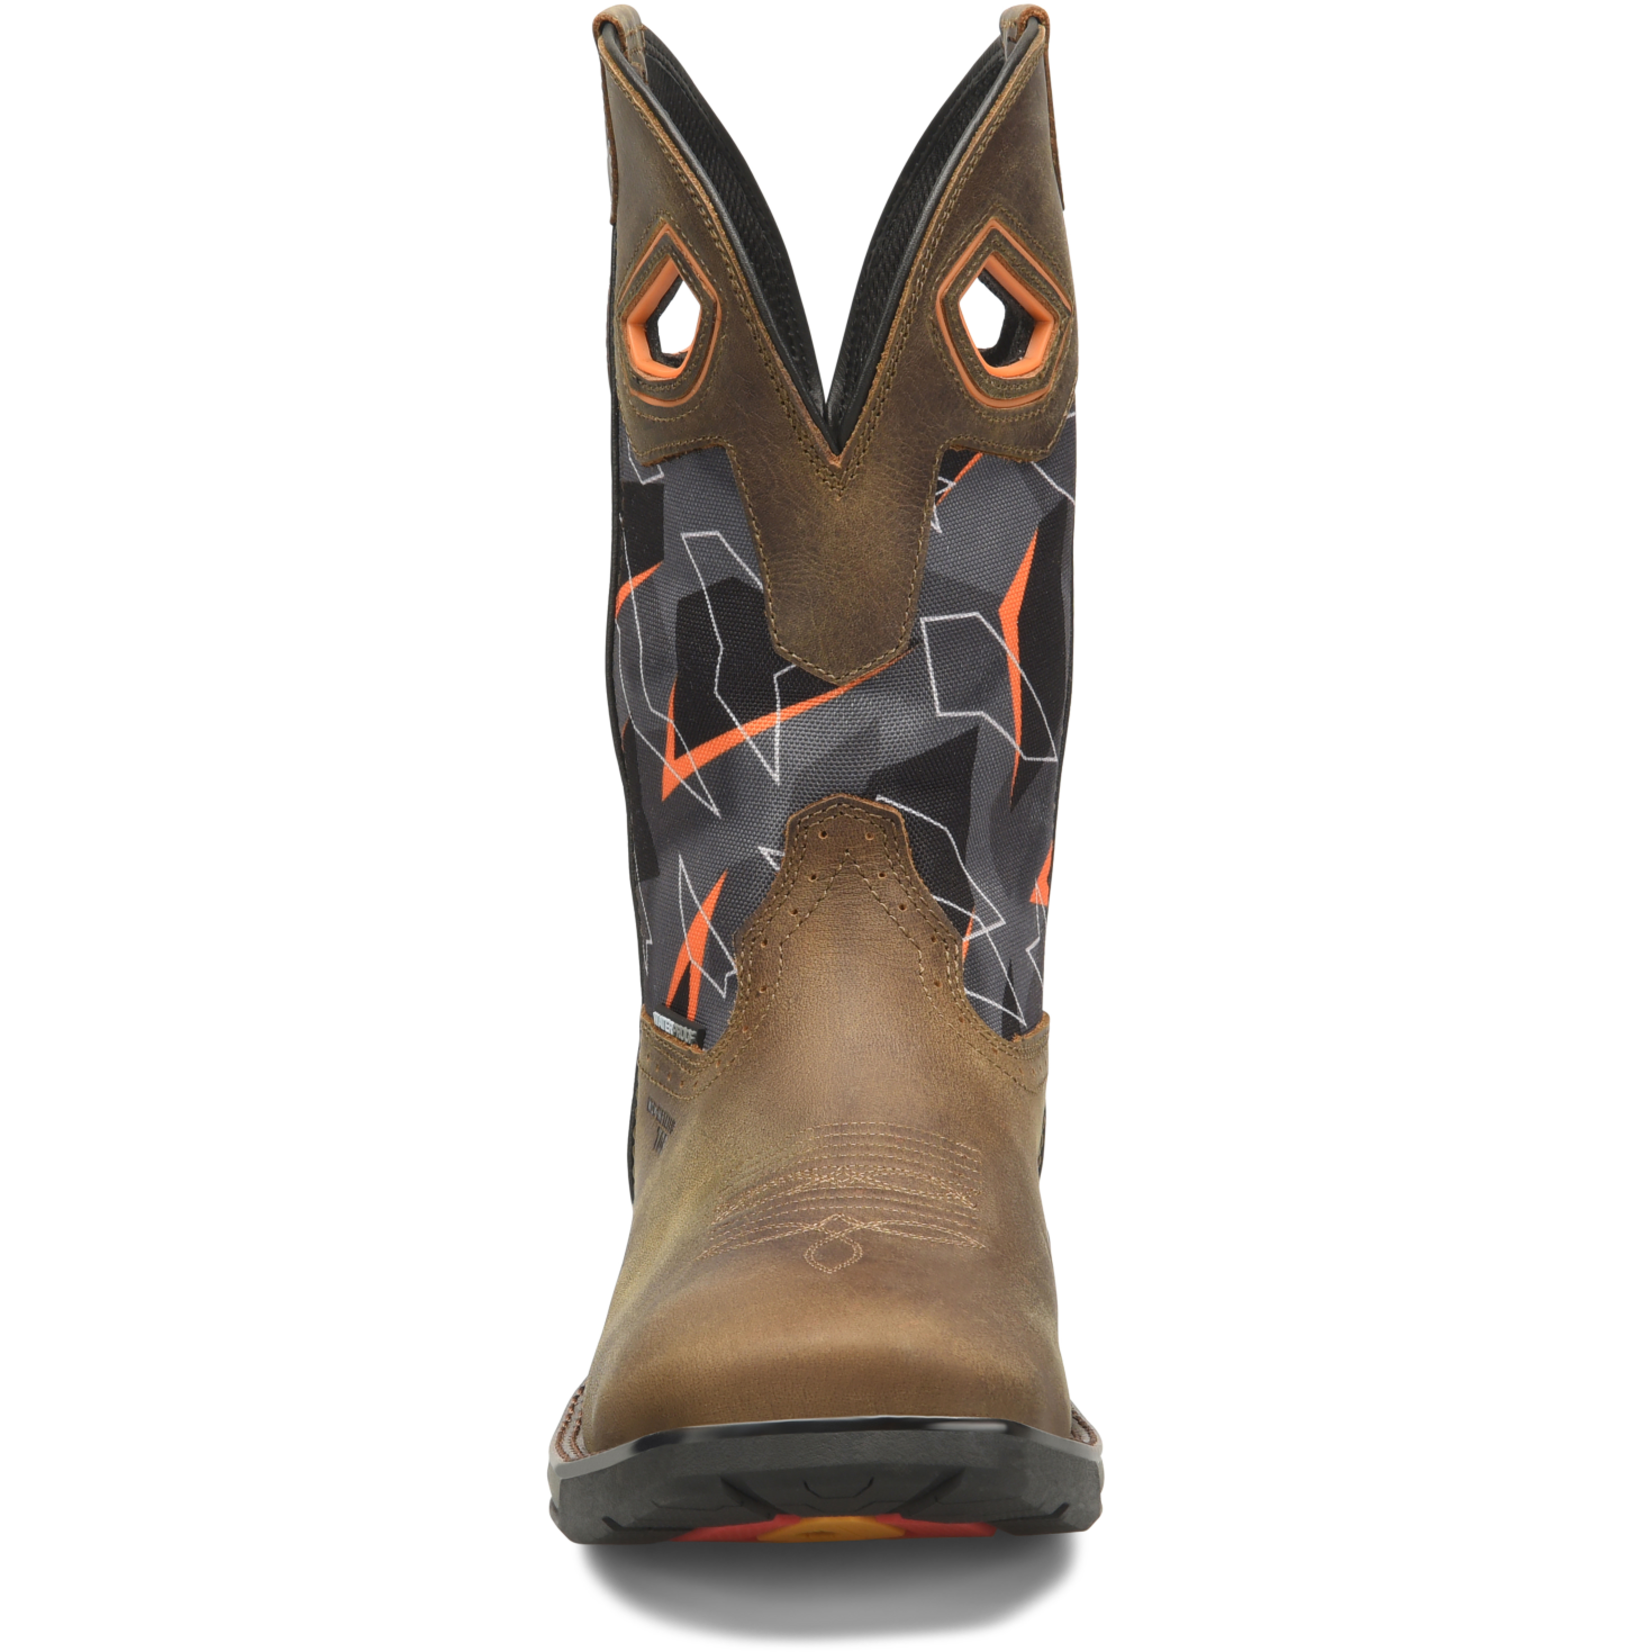 Double H Men's Double H Composite Toe & Waterproof Zander DH5364